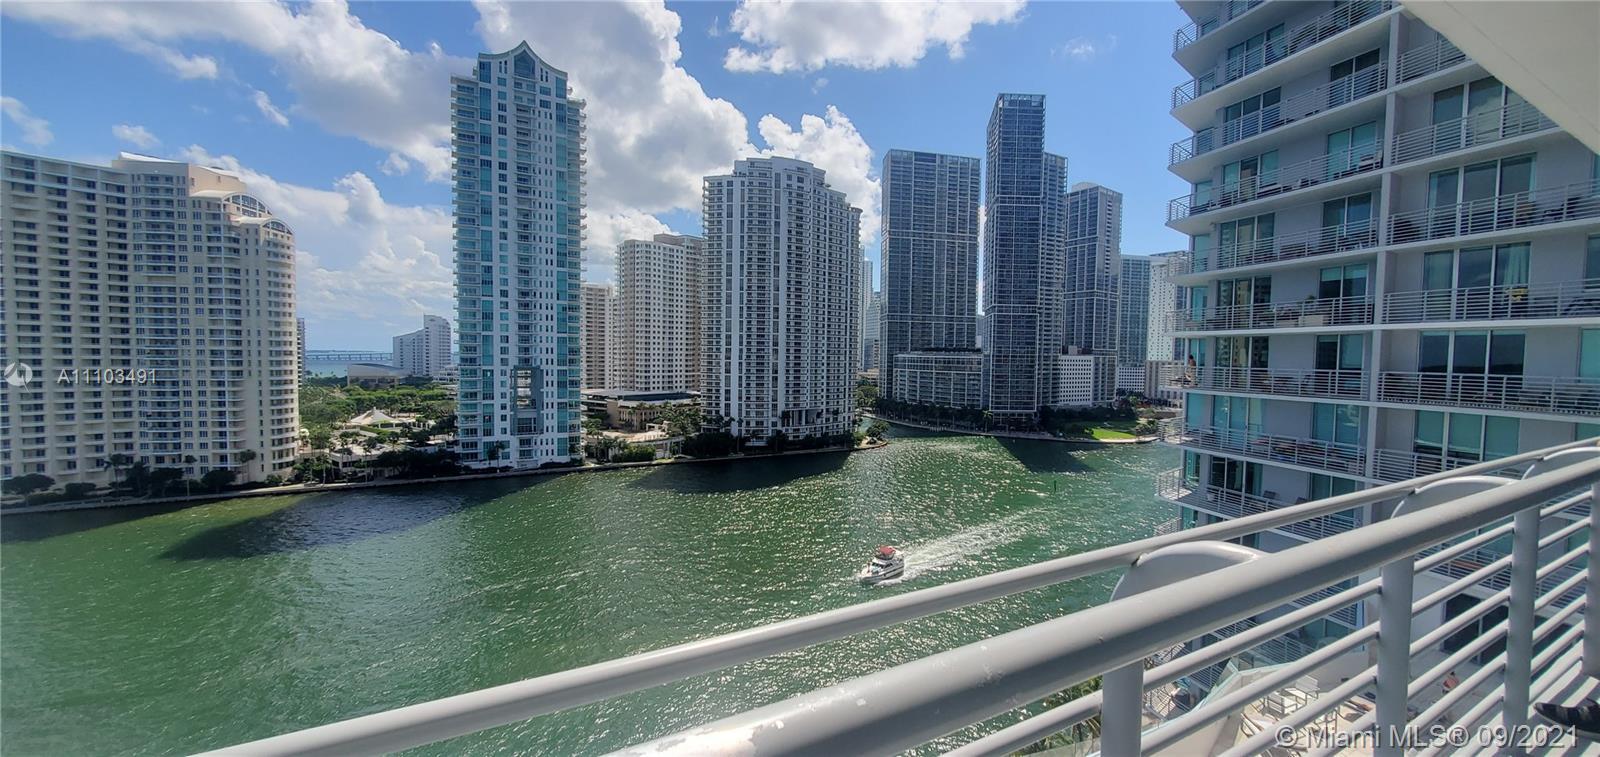 One Miami East #1503 - 335 S Biscayne Blvd #1503, Miami, FL 33131